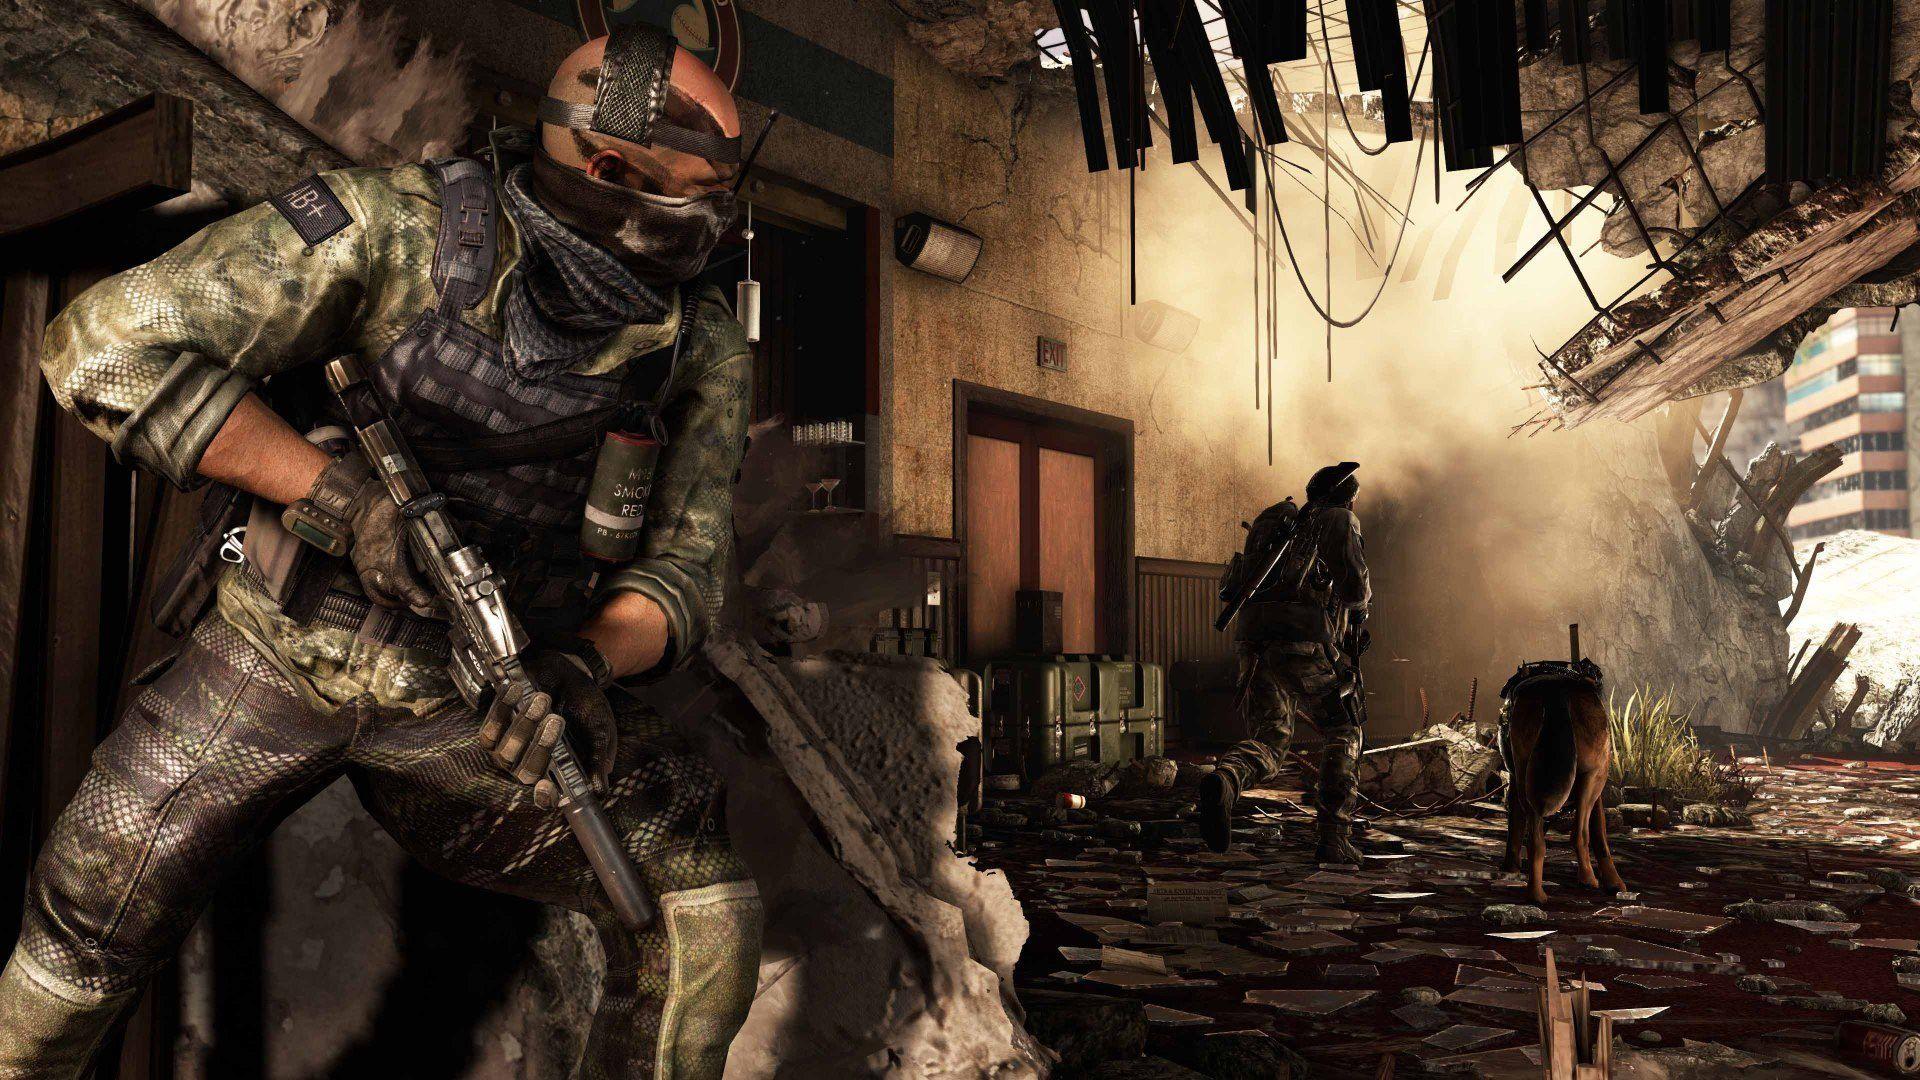 Call-Of-Duty-Ghosts Screenshot 02